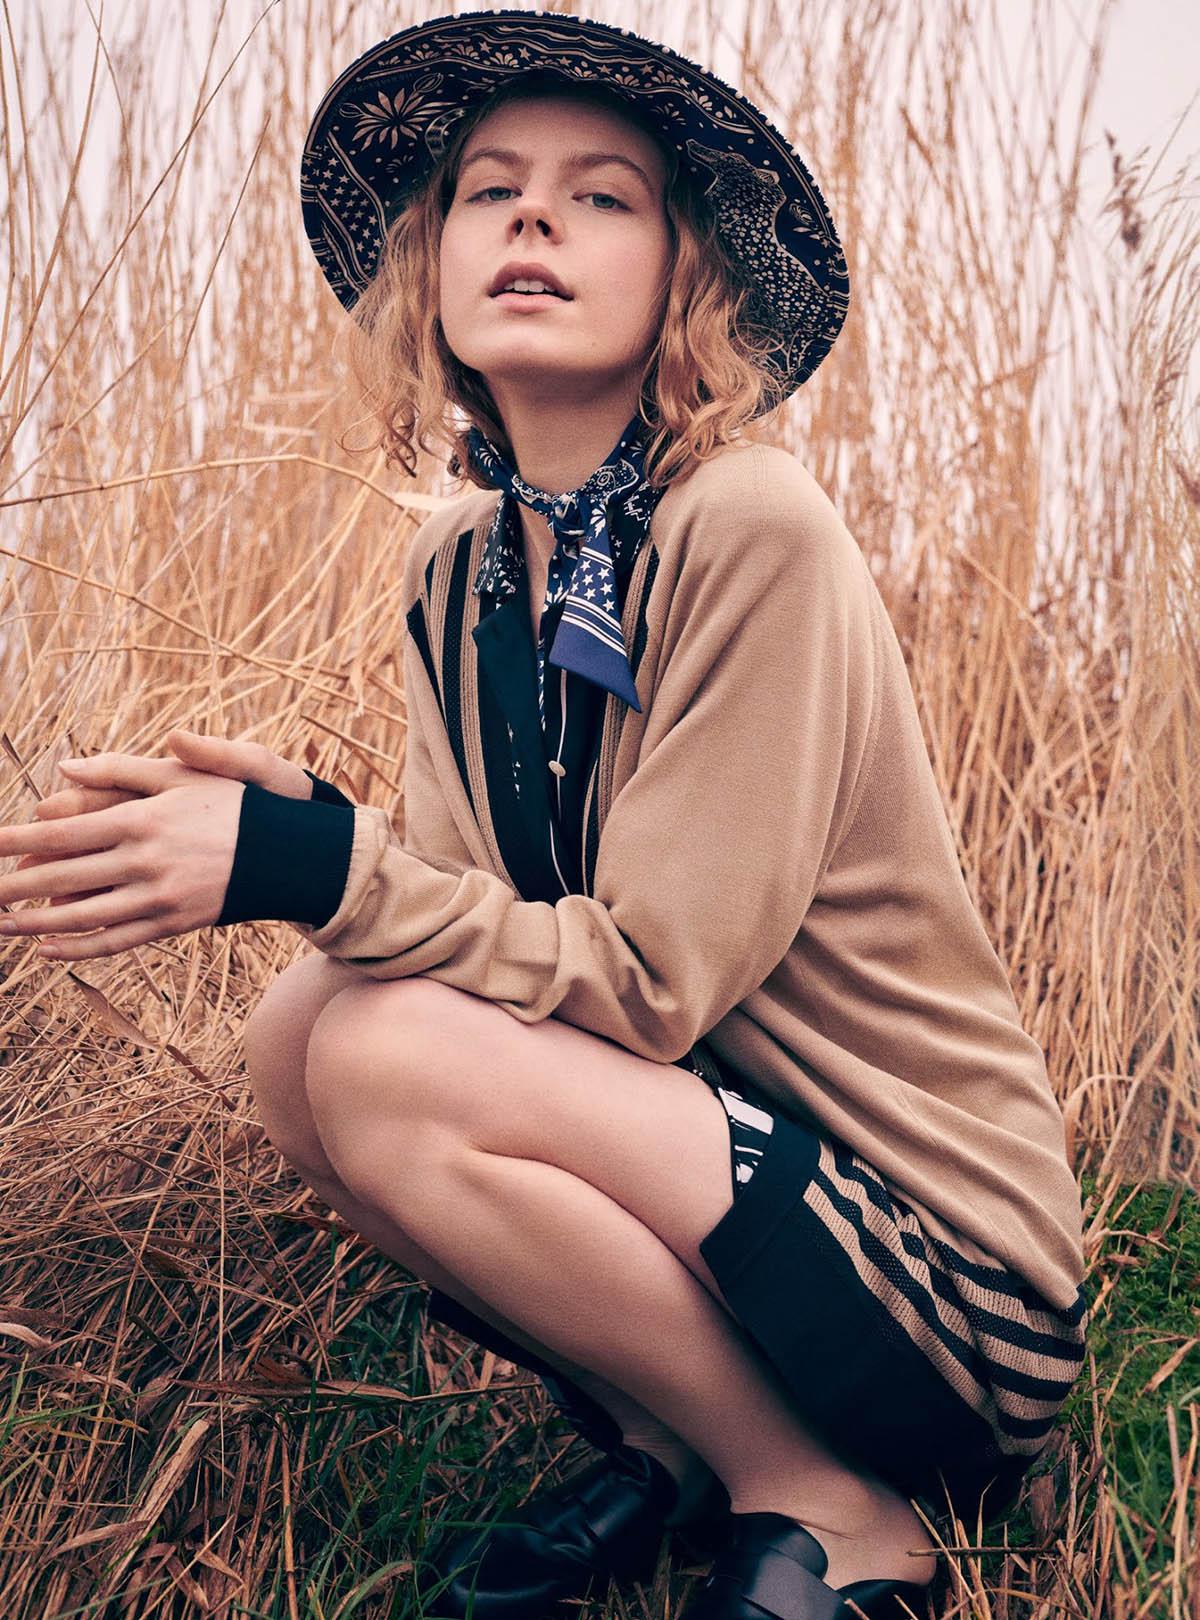 Jolie Alien by Jem Mitchell for Harper's Bazaar UK June 2021